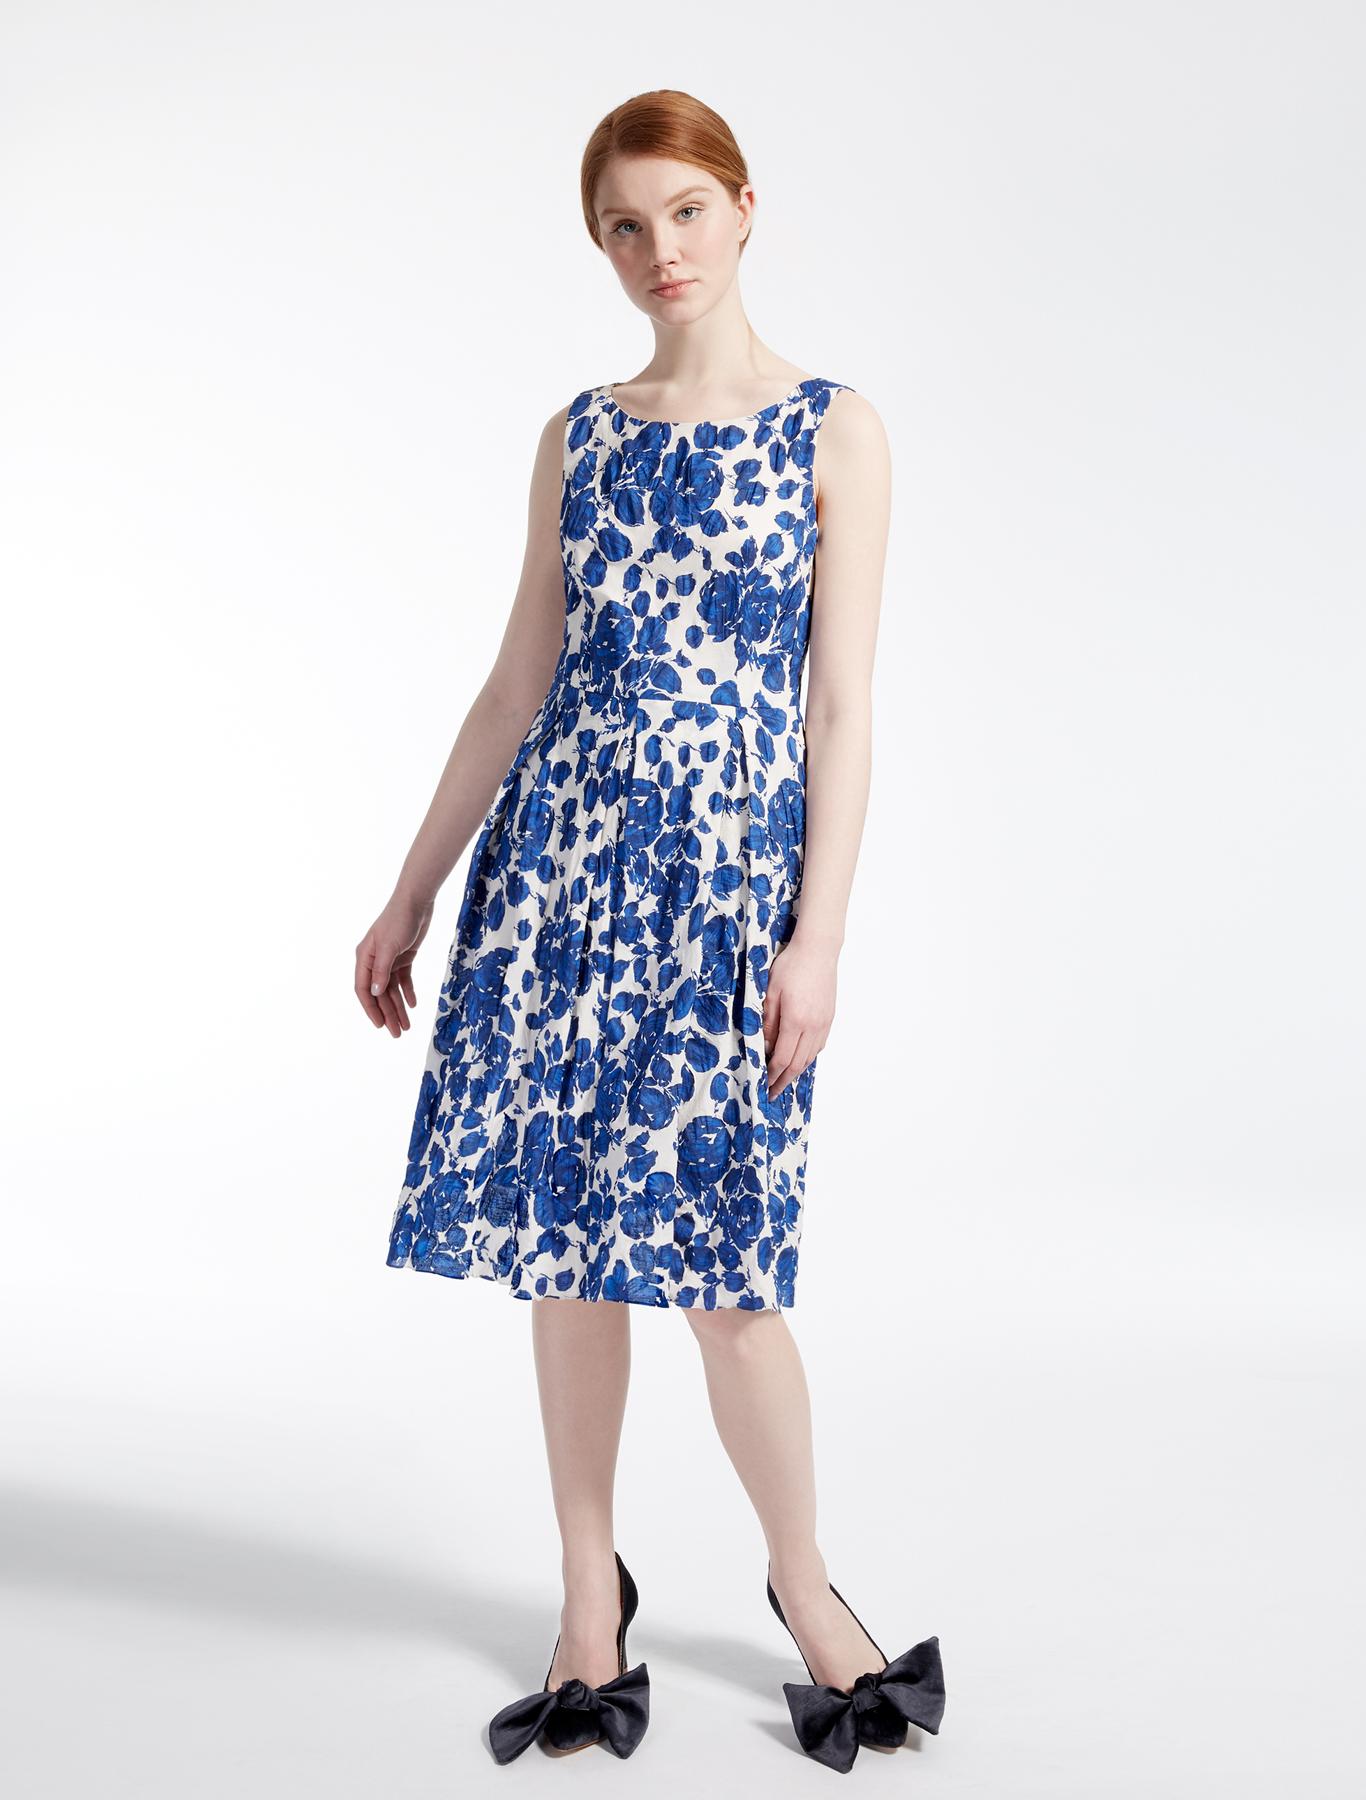 Cotton dress, cornflower blue